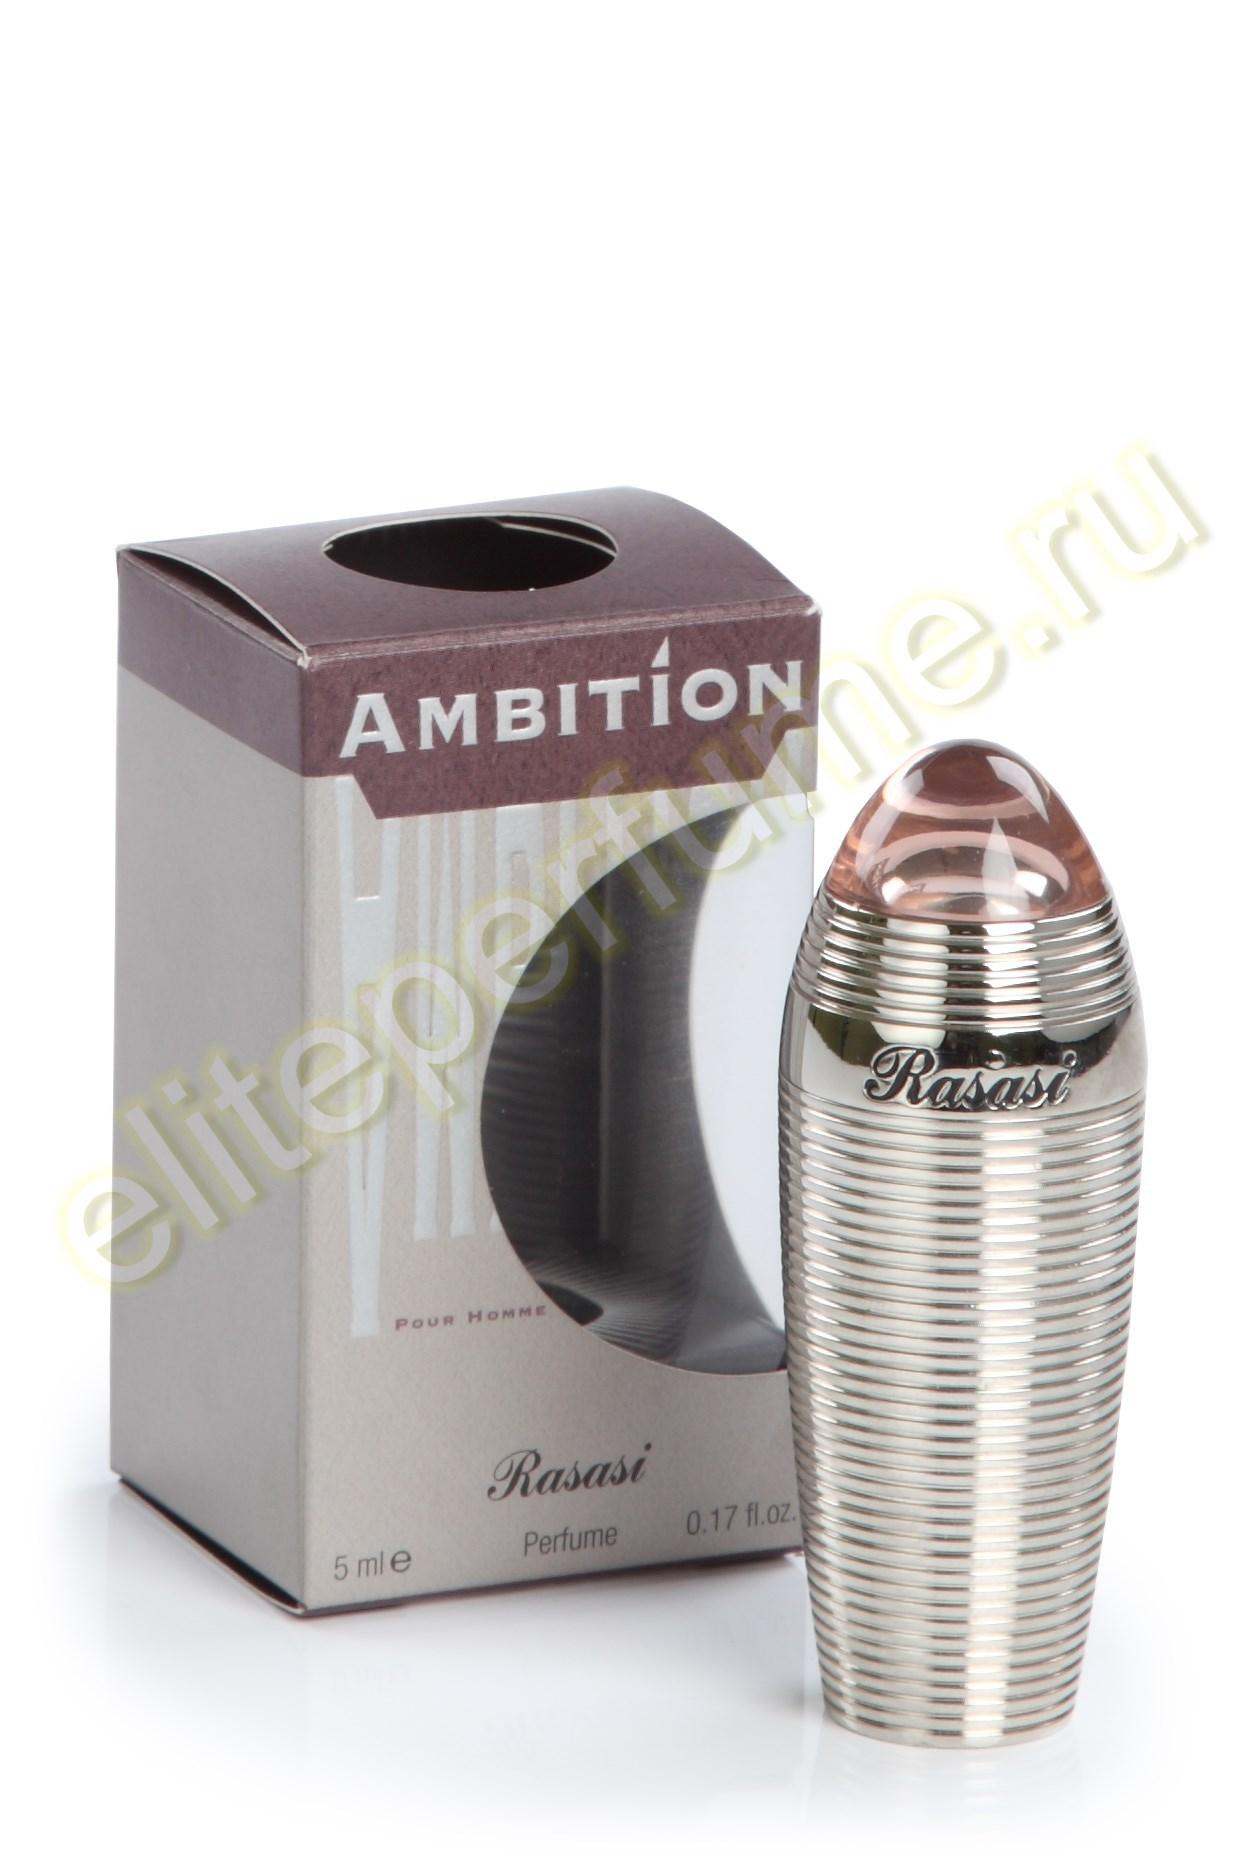 Амбиция Ambition 5 мл арабские мужские масляные духи от Расаси Rasasi Perfumes